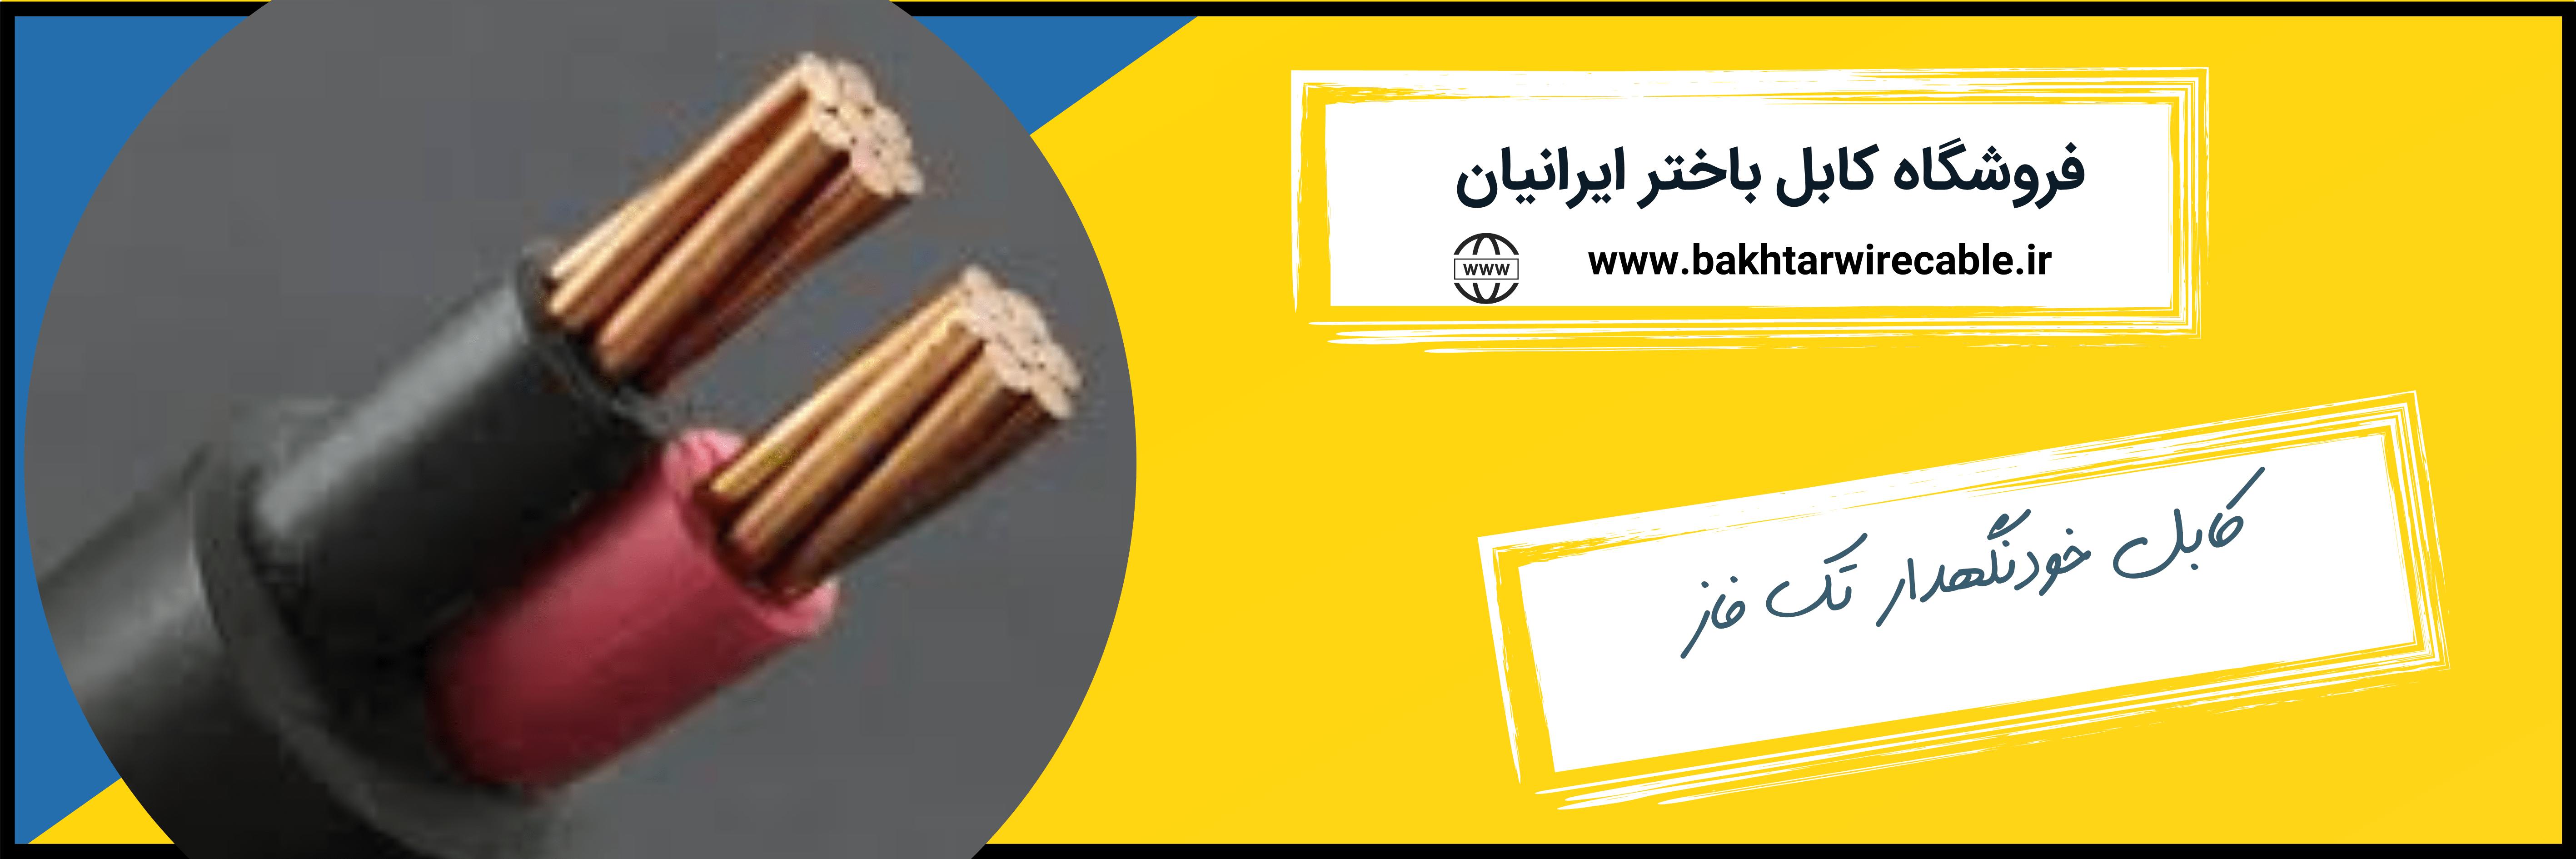 کابل تک فاز